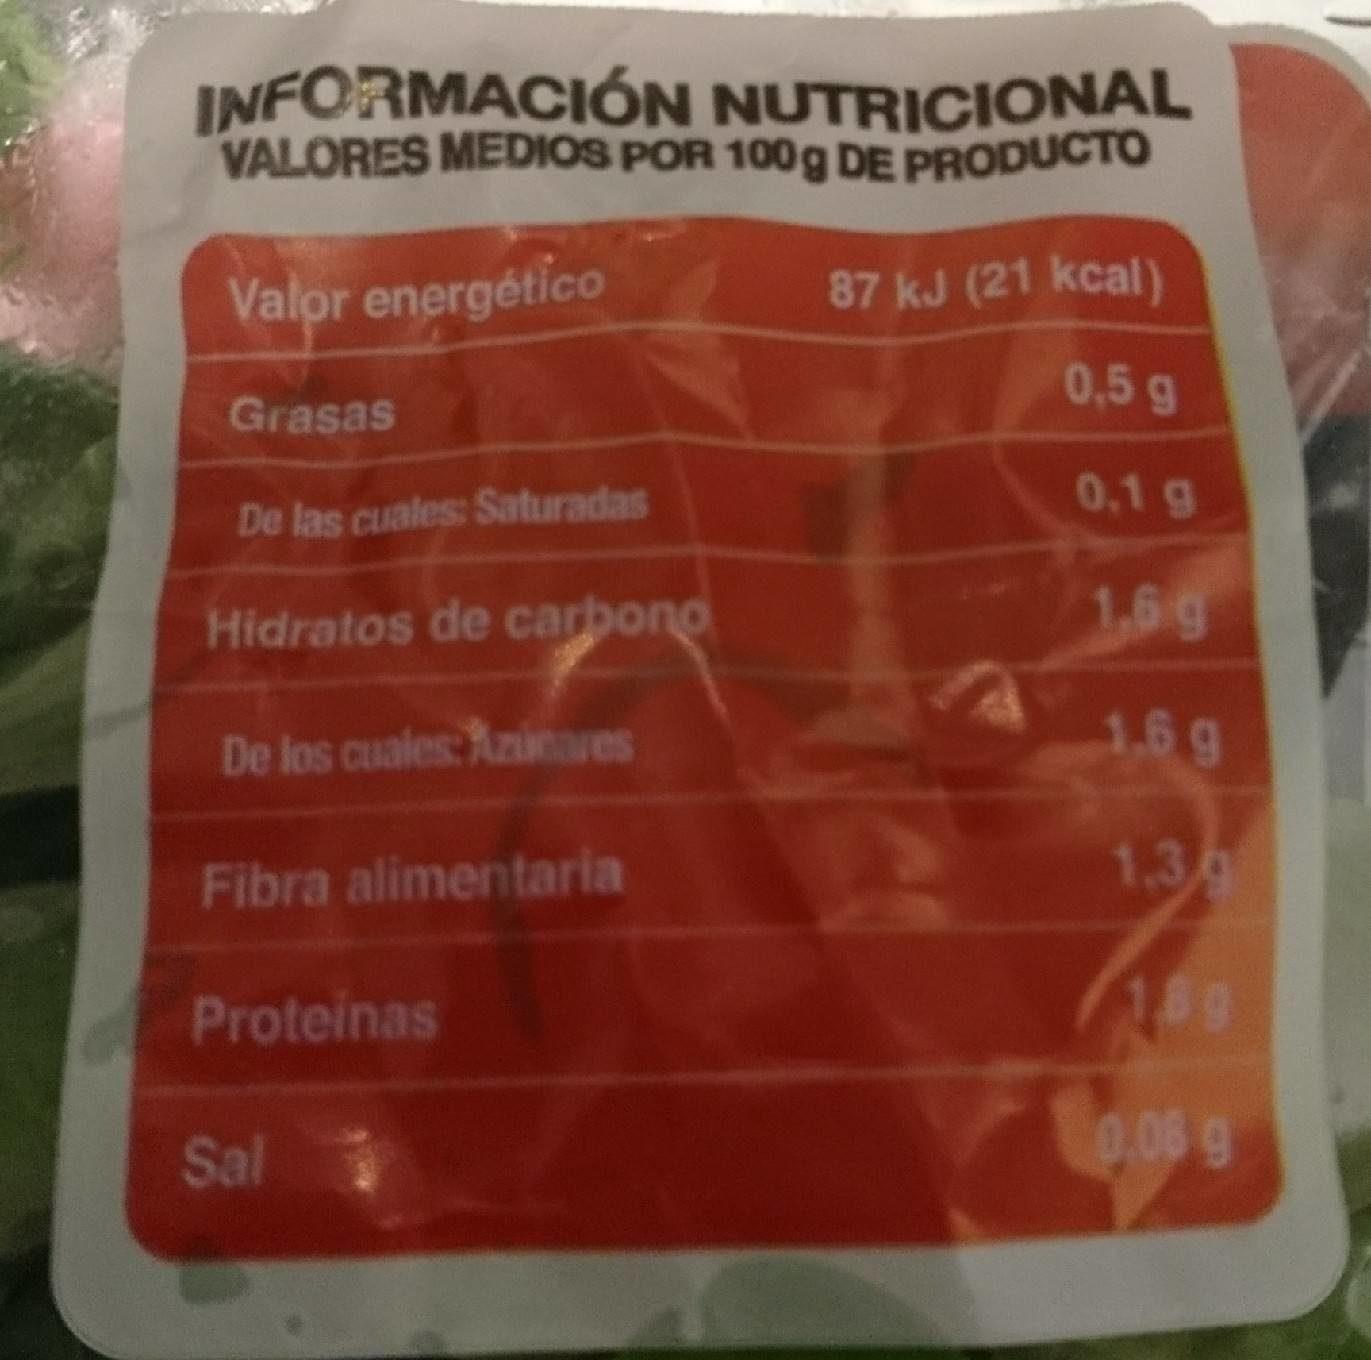 Canónigos lavados - Informations nutritionnelles - fr